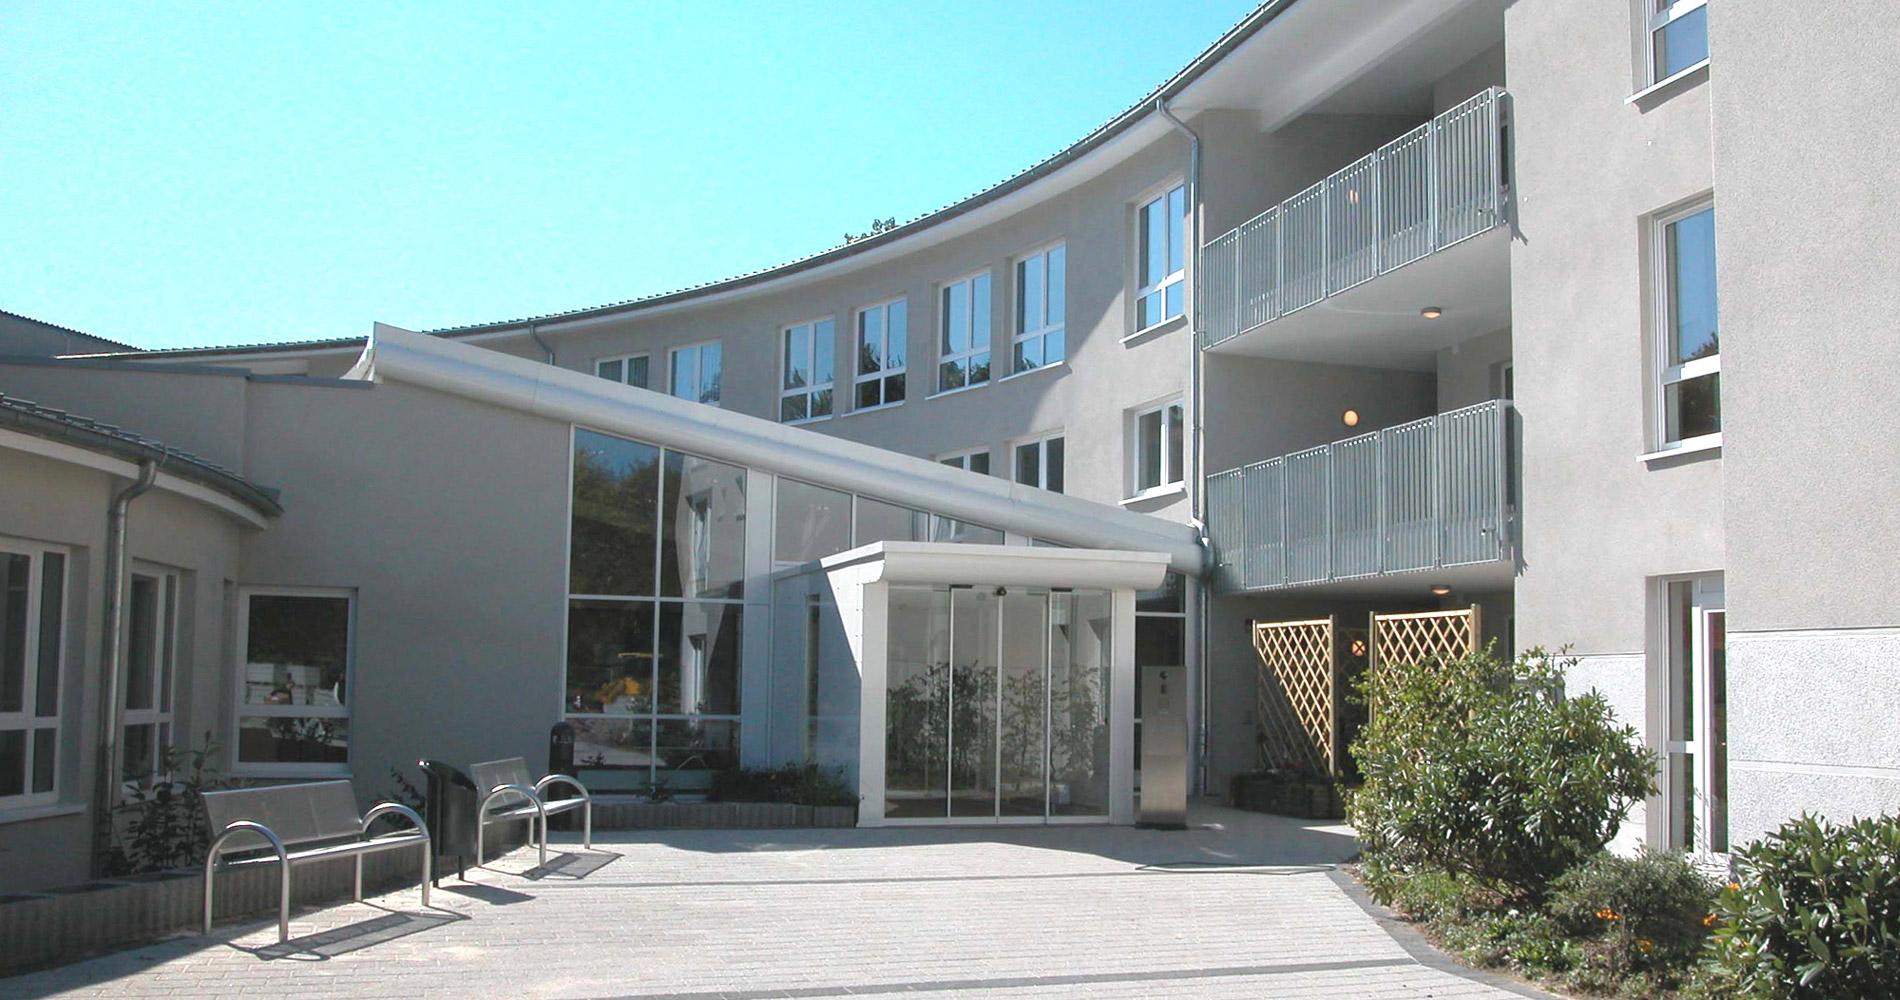 Seniorenheim_Aussen-1